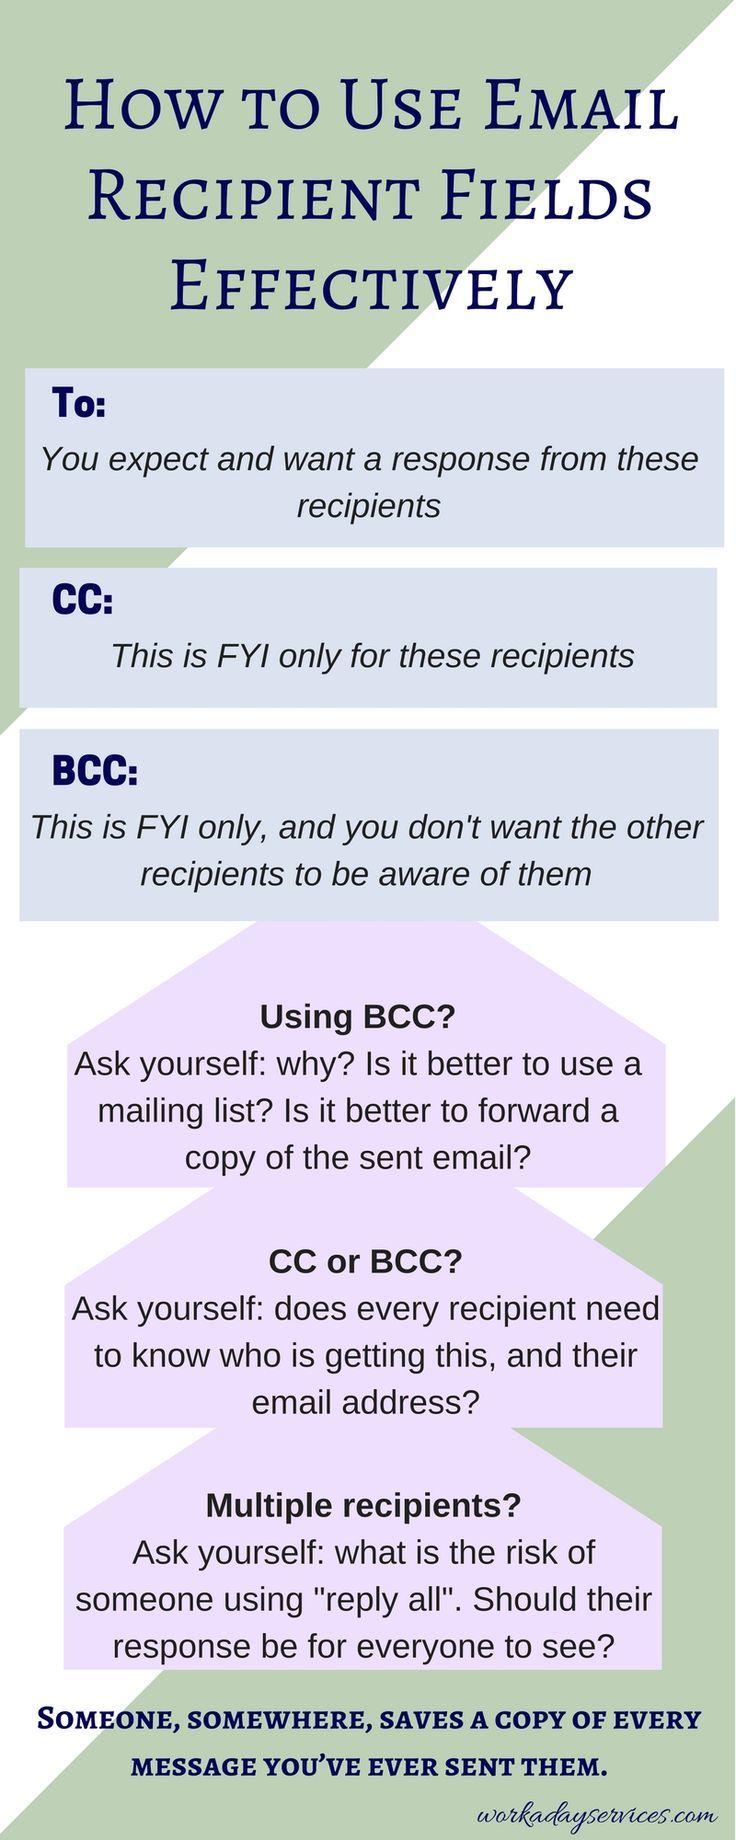 Email Recipient Fields infographic